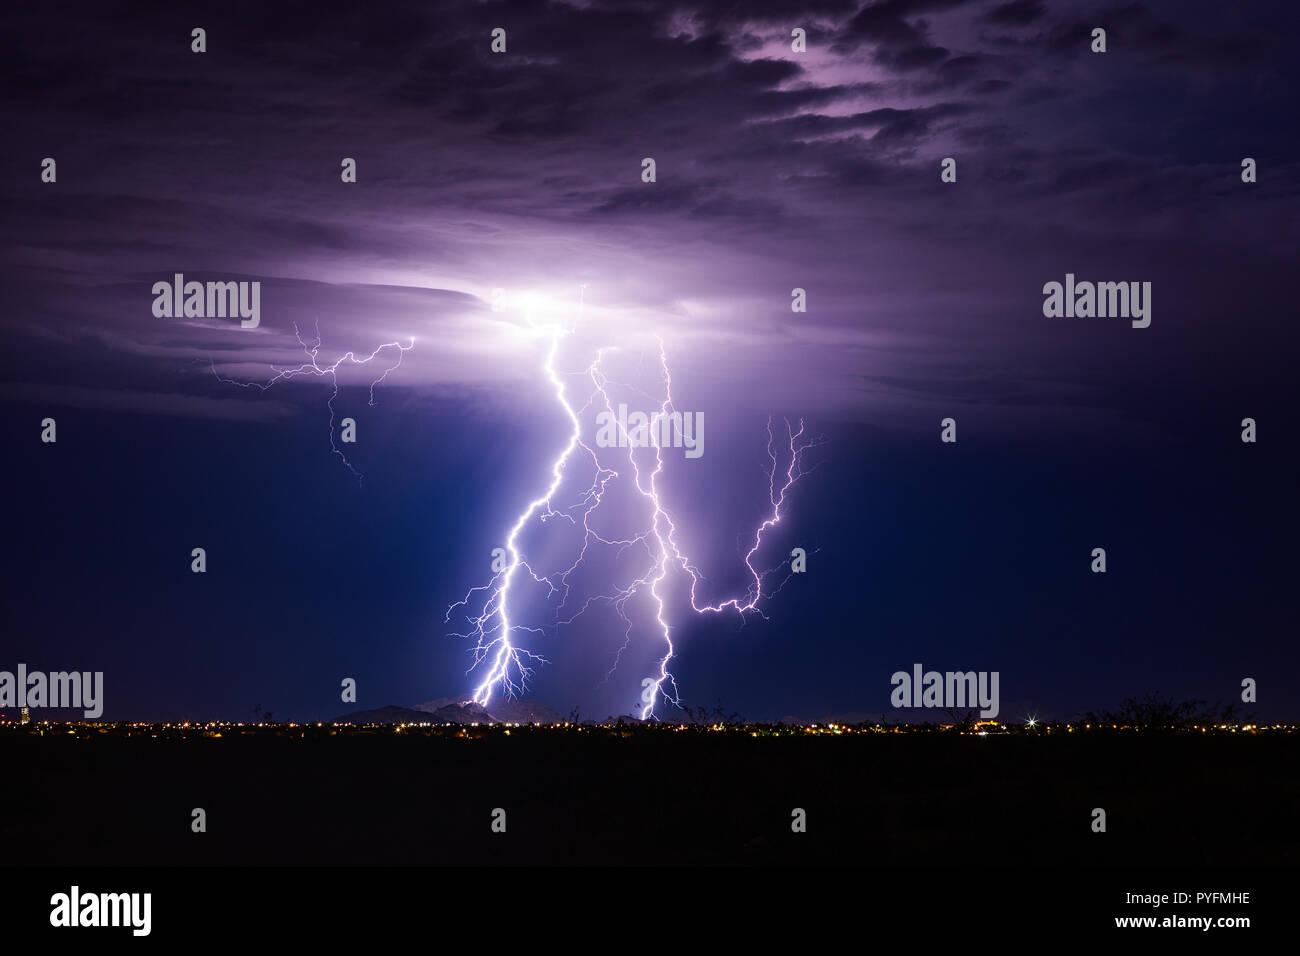 Lightning bolt storm over Casa Grande, Arizona. Stock Photo